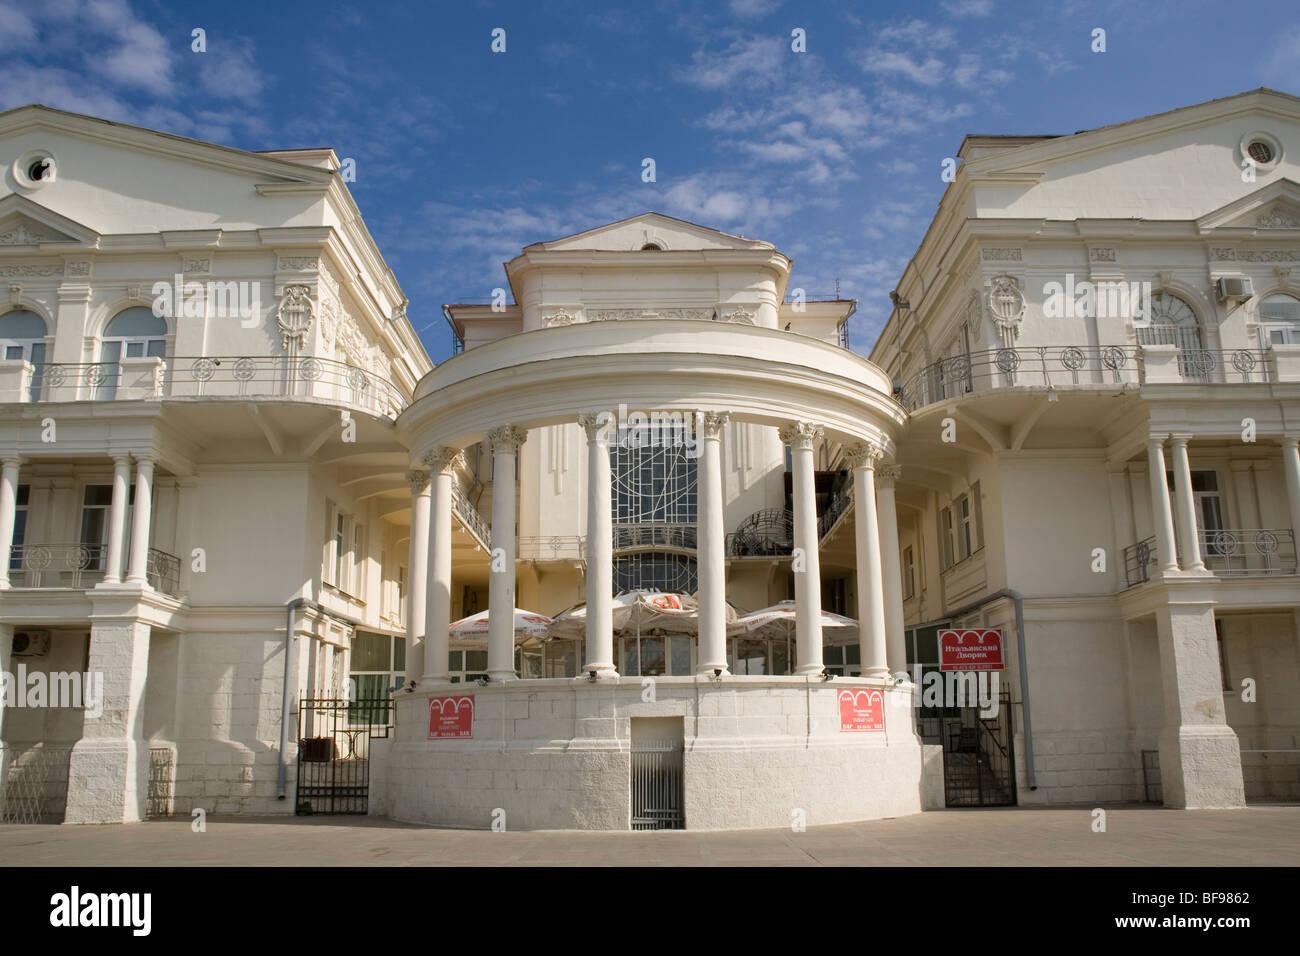 Ukraine Crimea Sevastopol Theatre - Stock Image